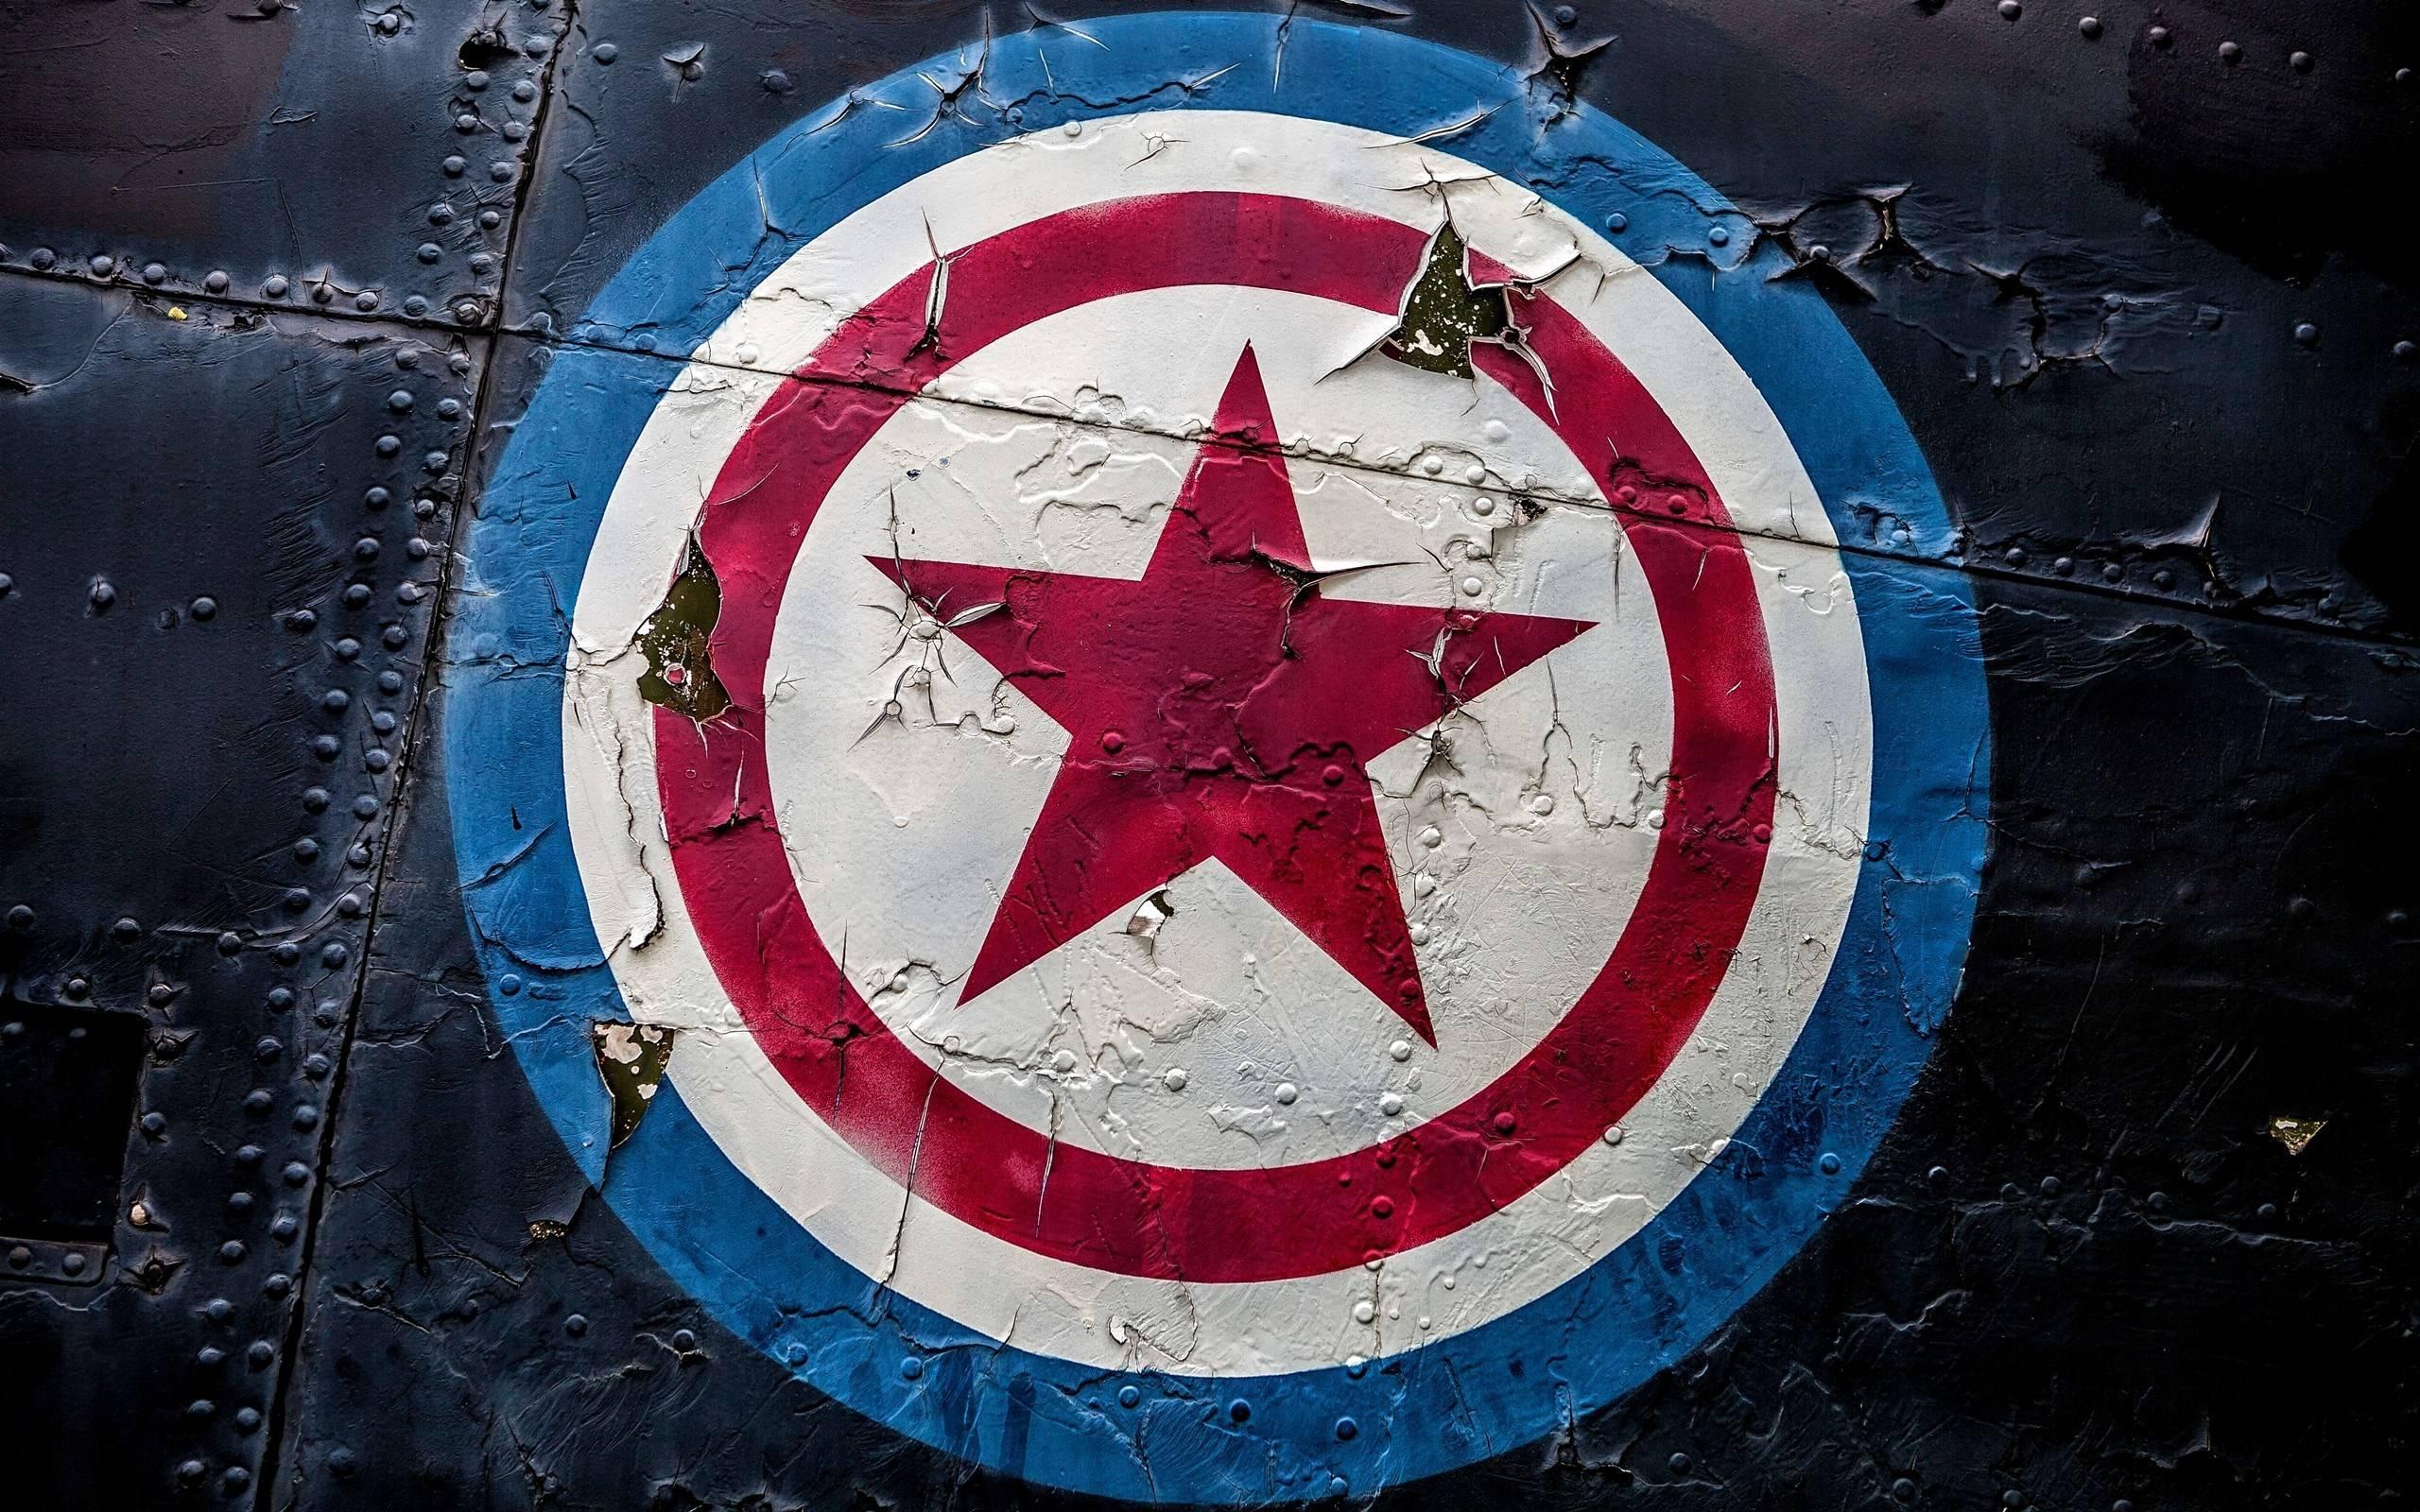 1920x1080 Captain America Laptop Full Hd 1080p Hd 4k Wallpapers